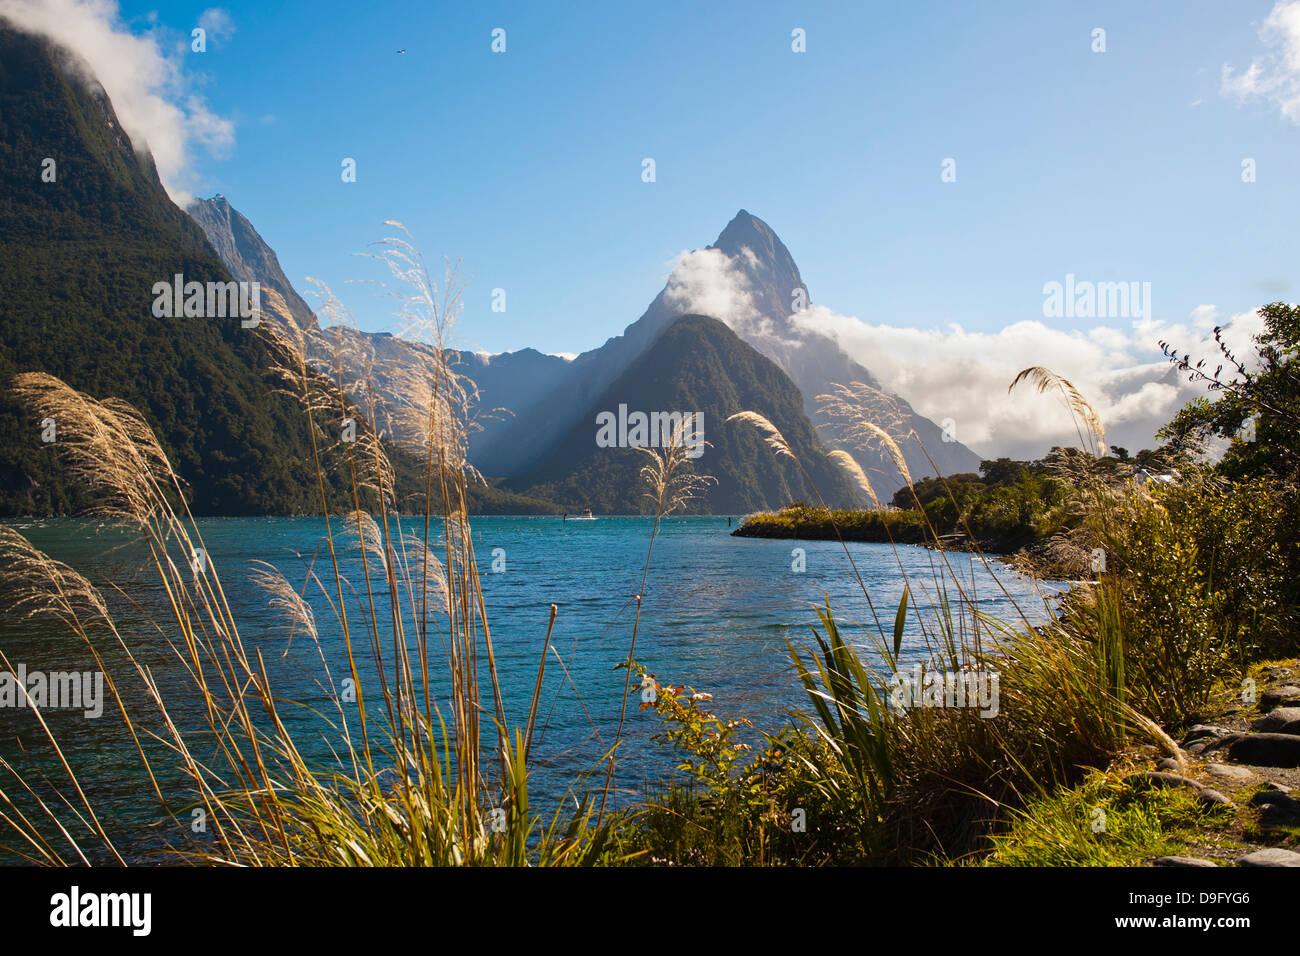 Mitre Peak, Milford Sound, Fiordland National Park, UNESCO World Heritage Site, South Island, New Zealand - Stock Image